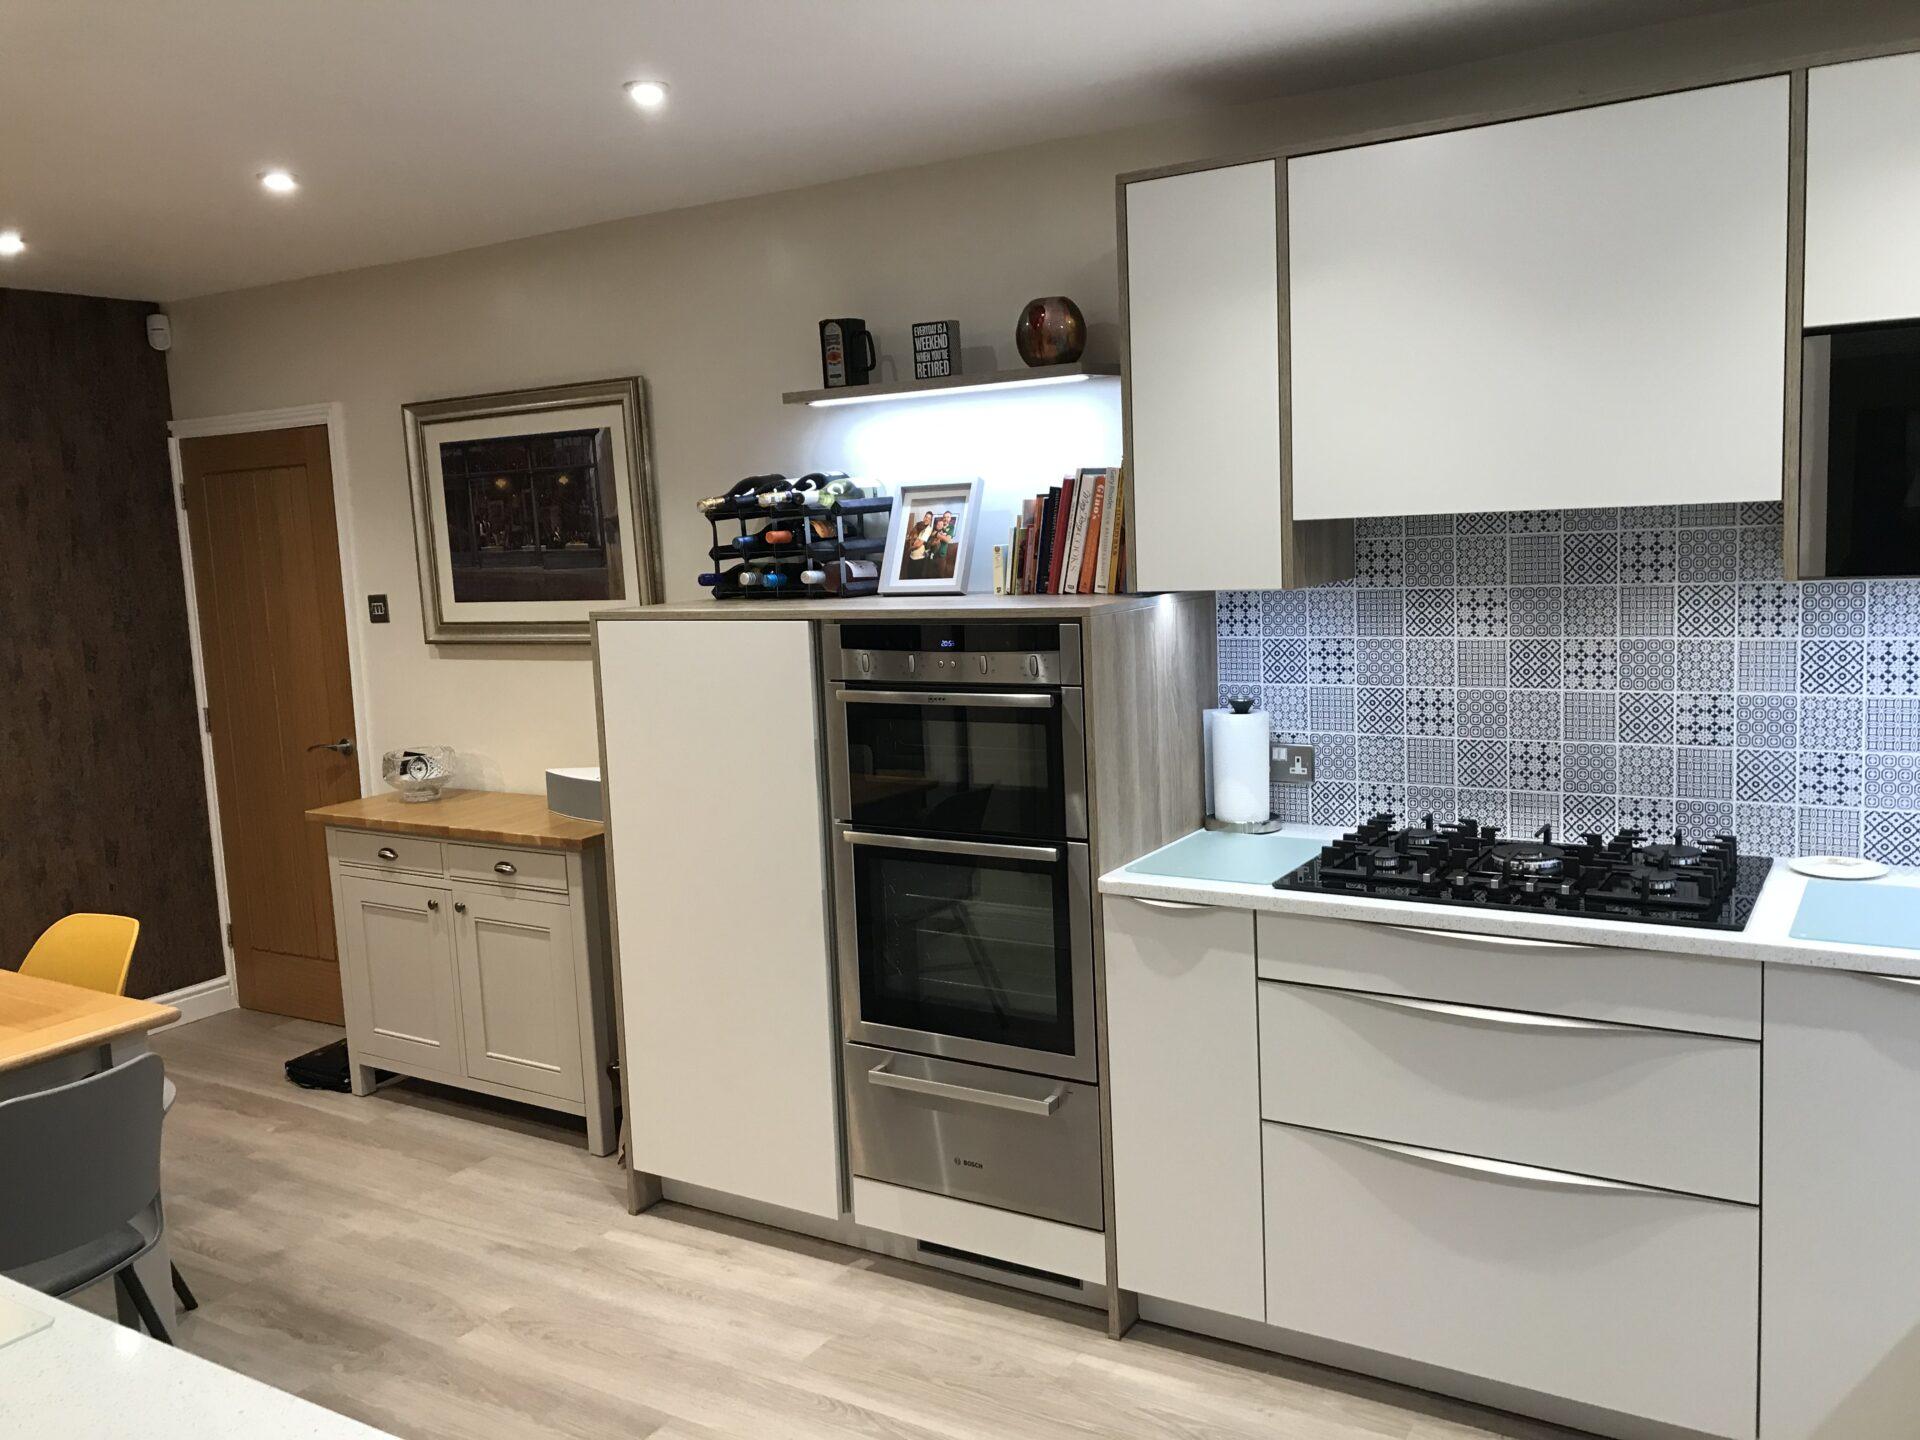 German Kitchen Super Matt with Solid Quartz Worktops (Newport)